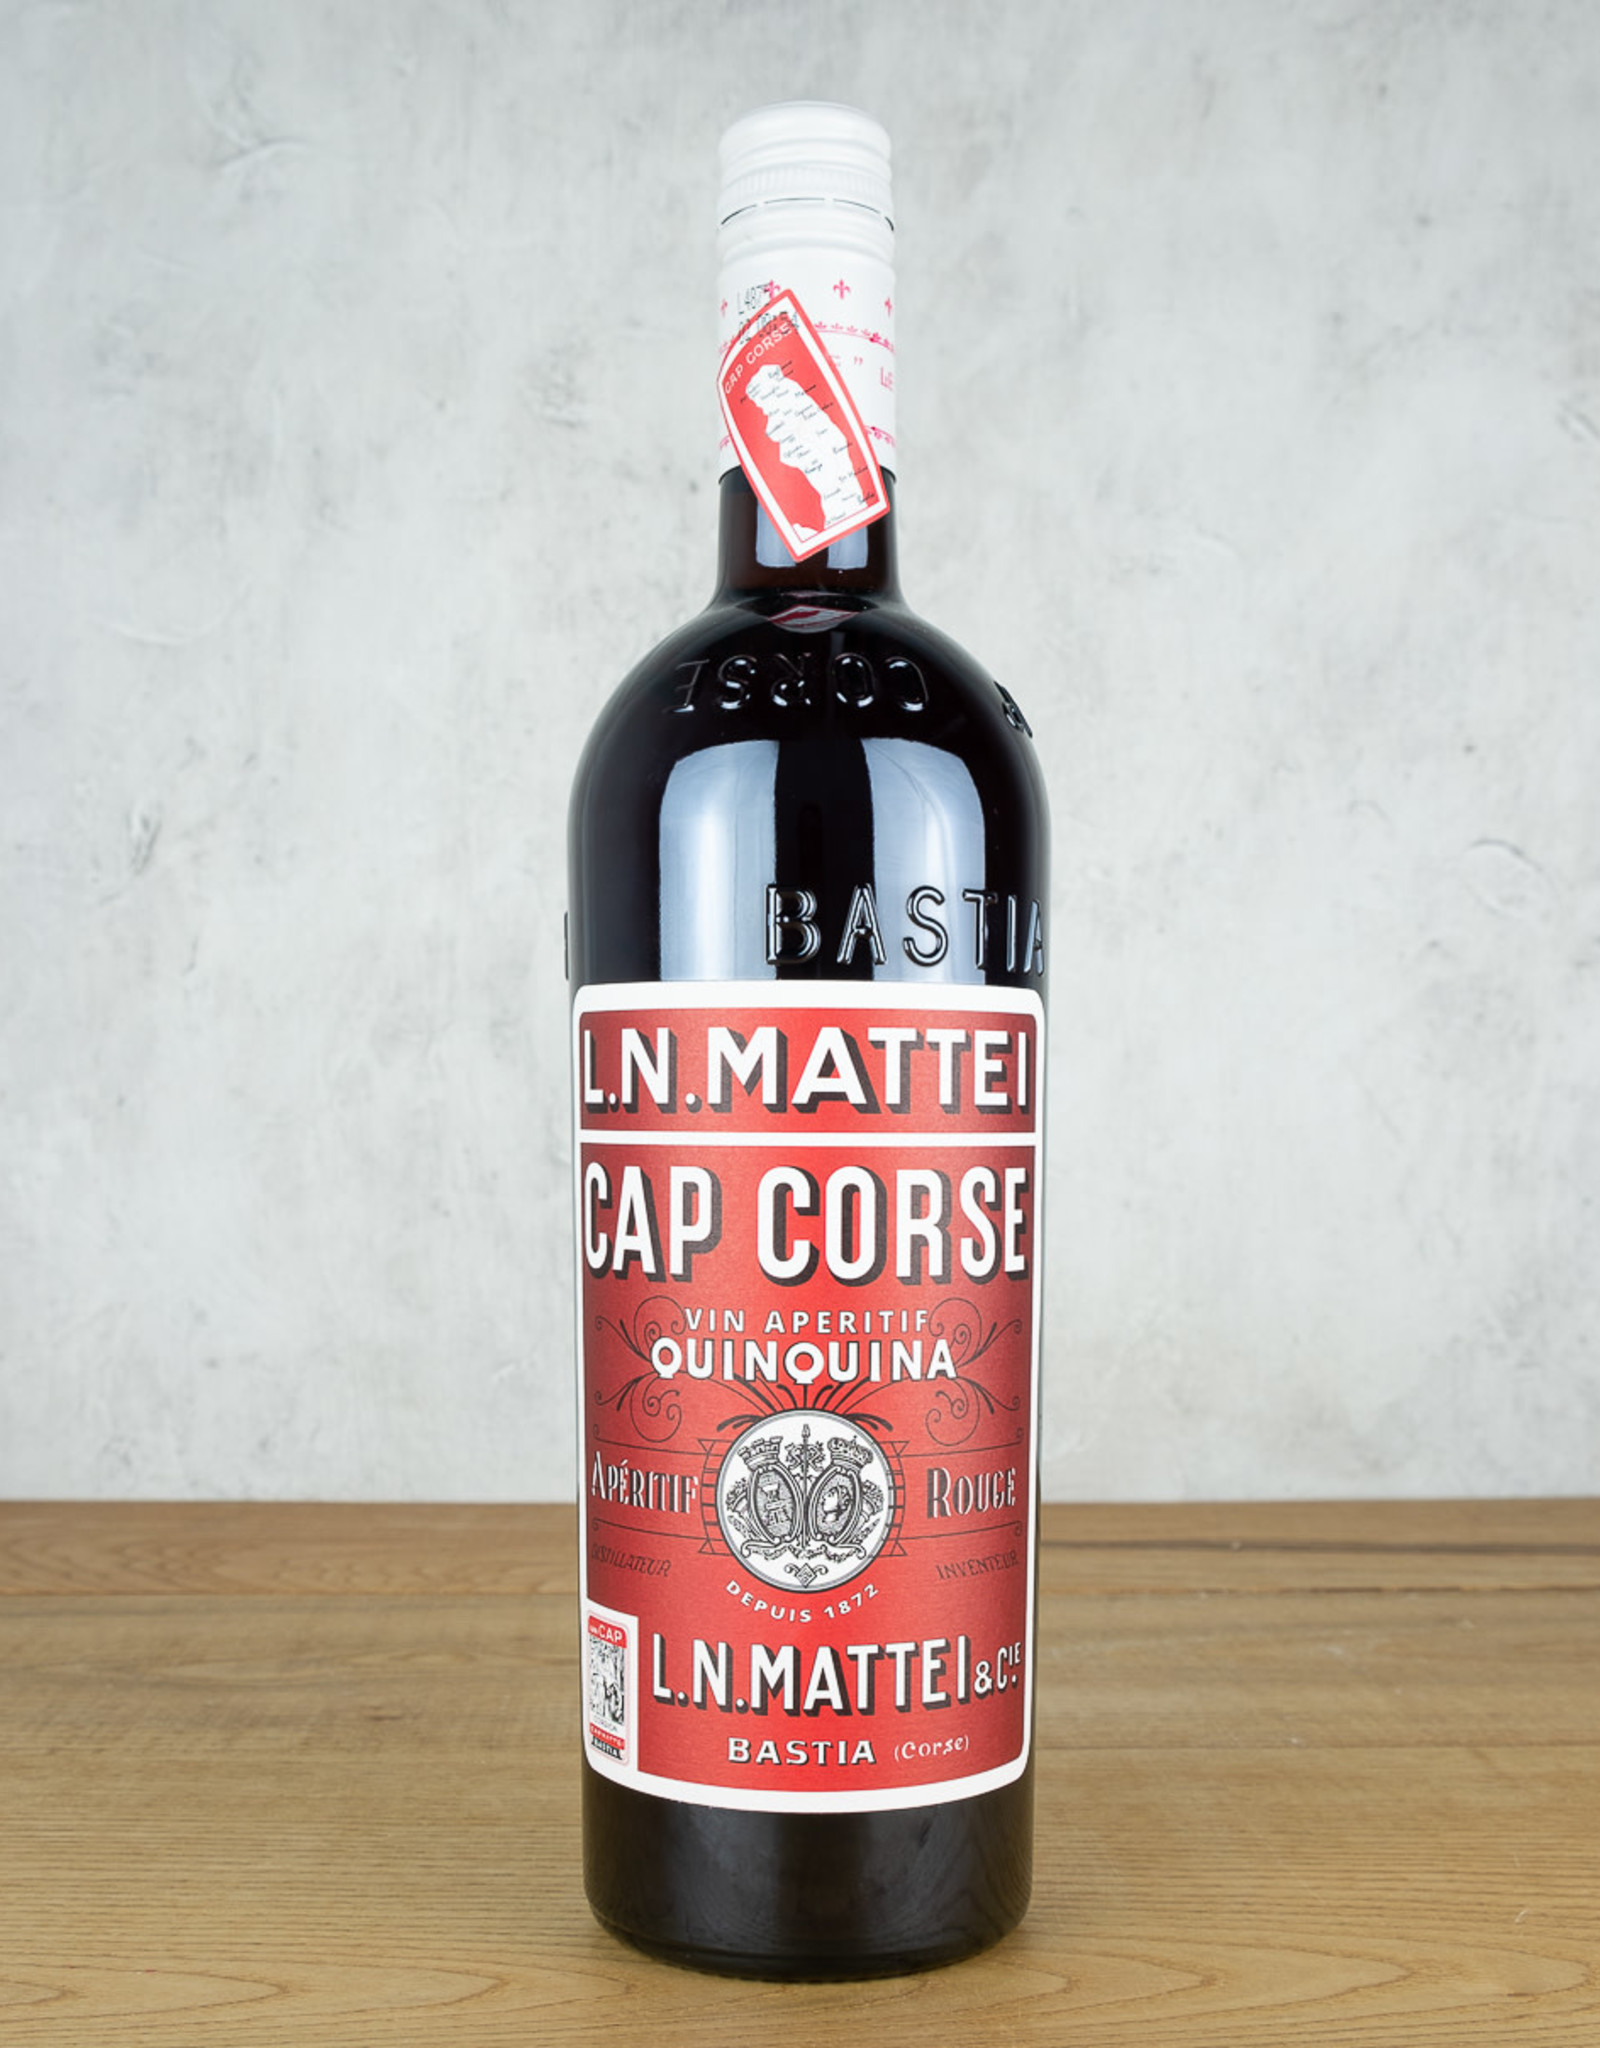 L.N. Mattei Cap Corse Quinquina Rouge